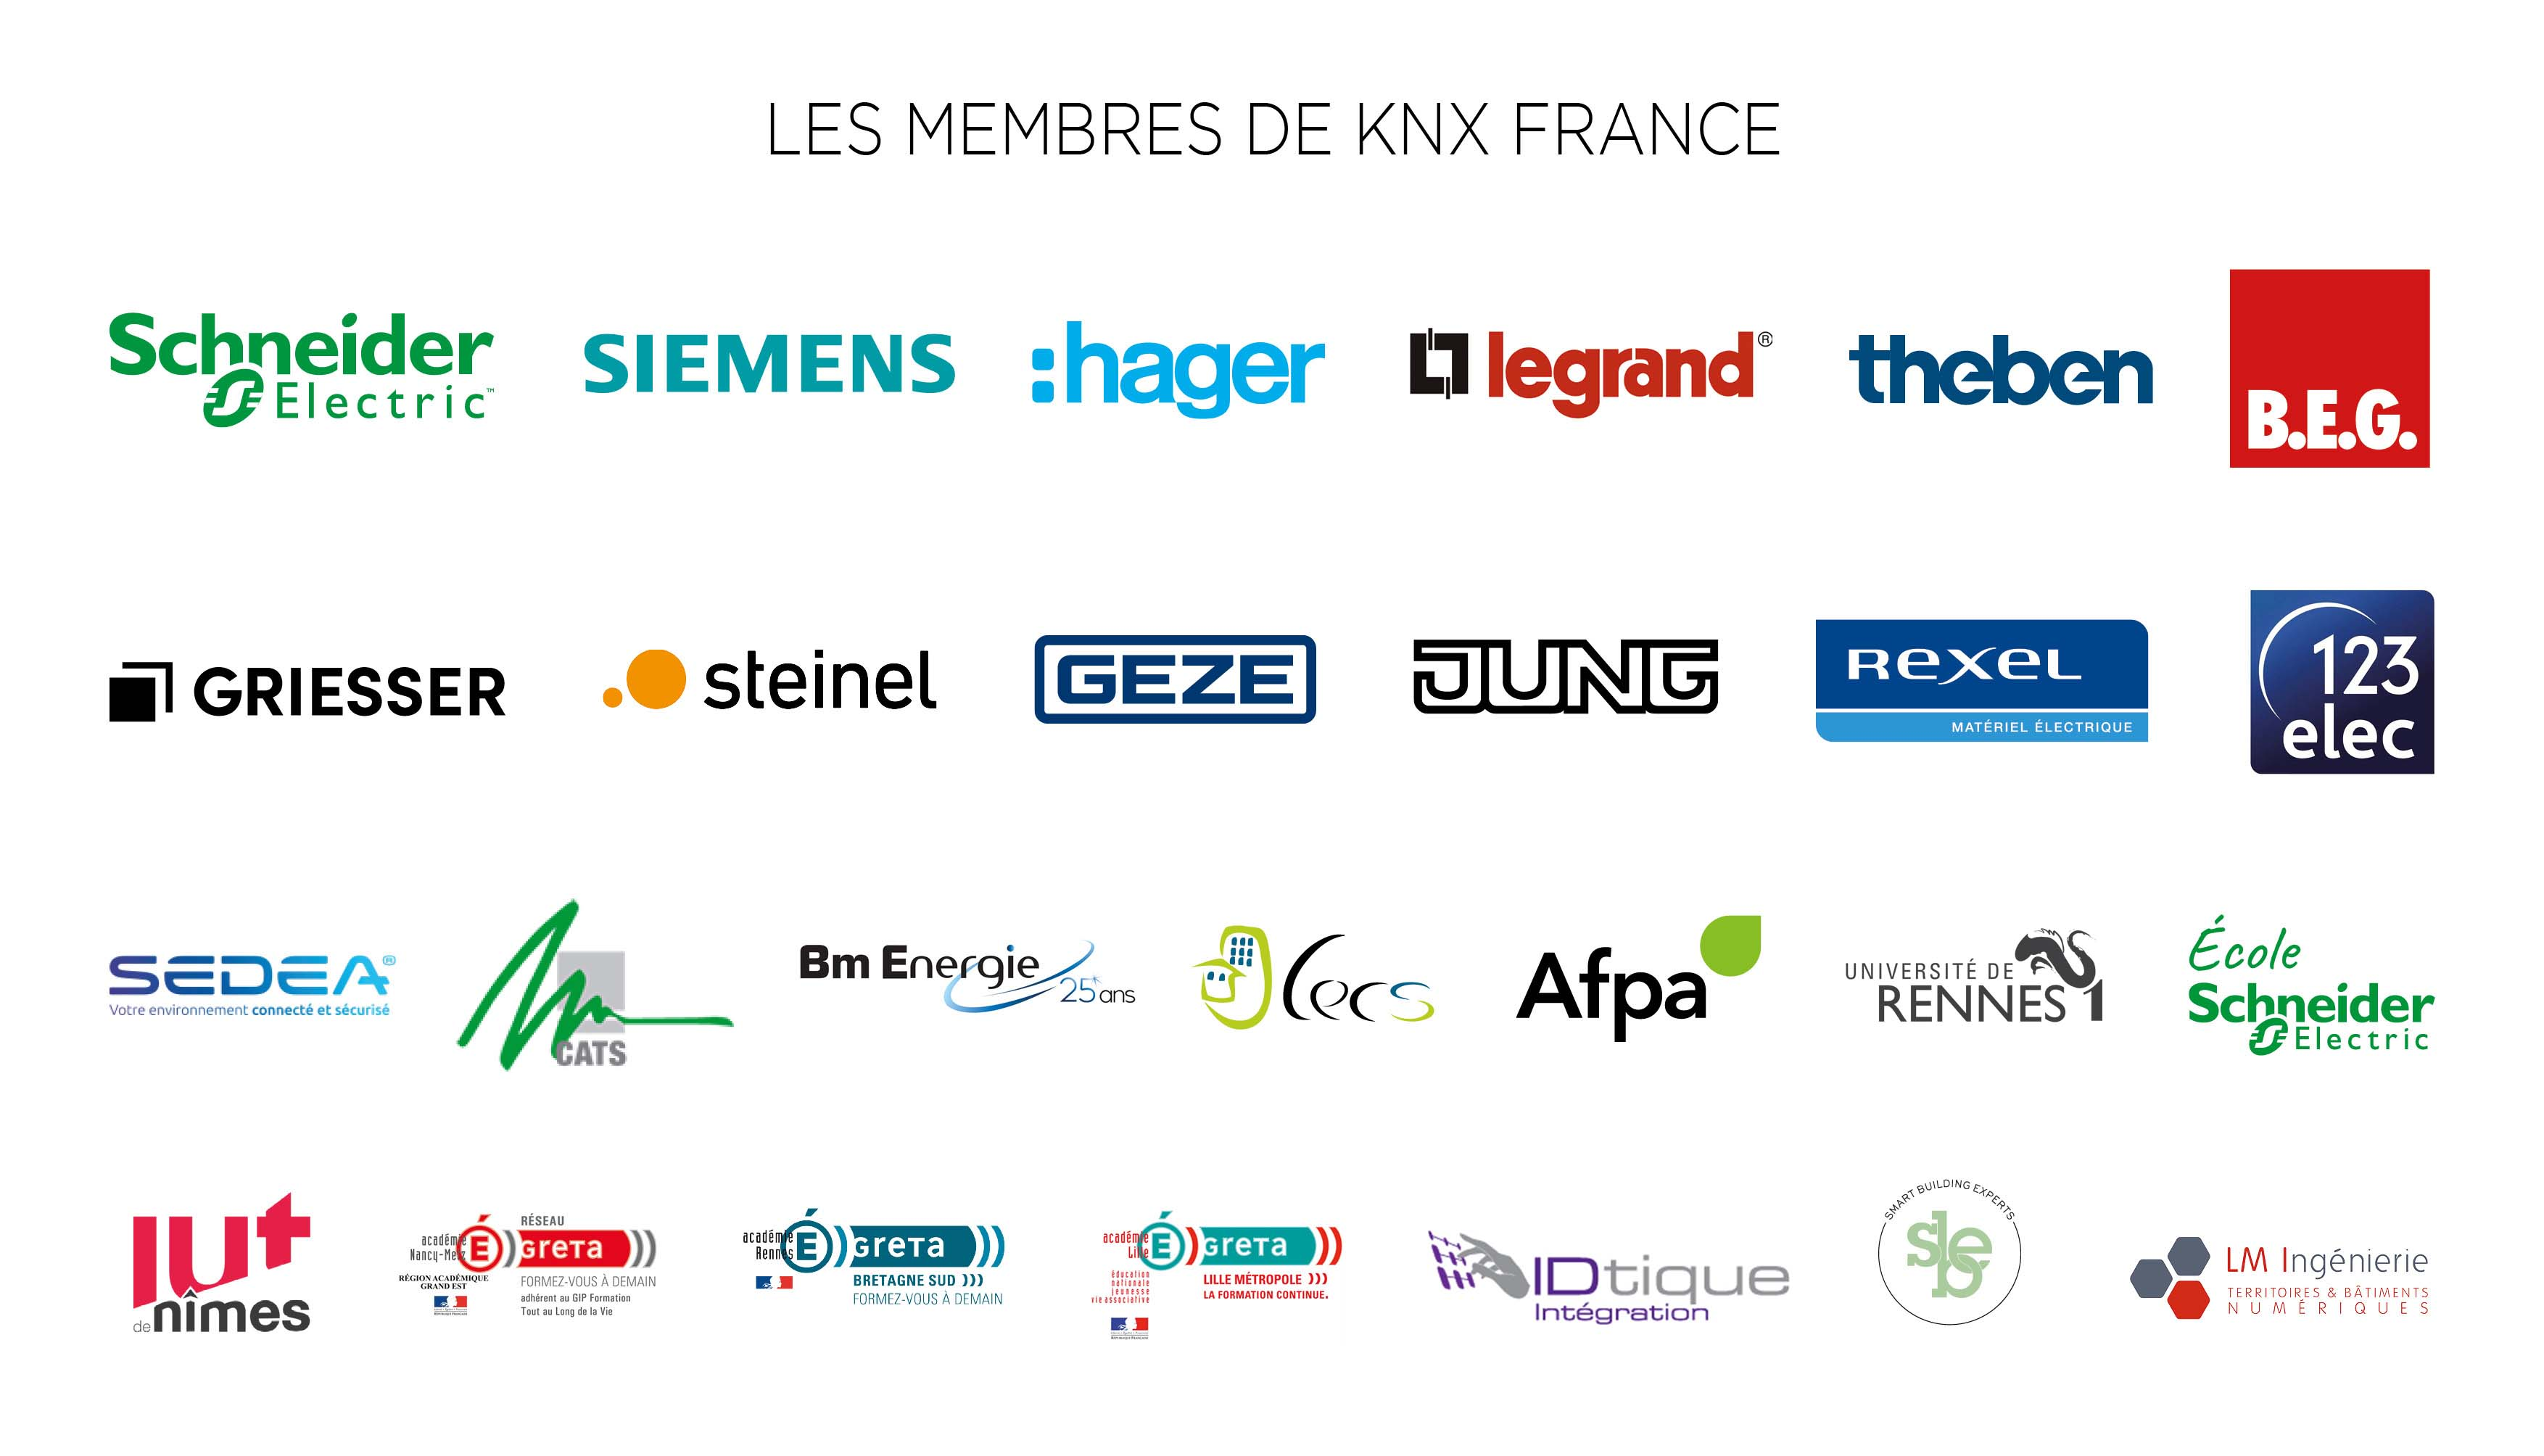 Membres de KNX France